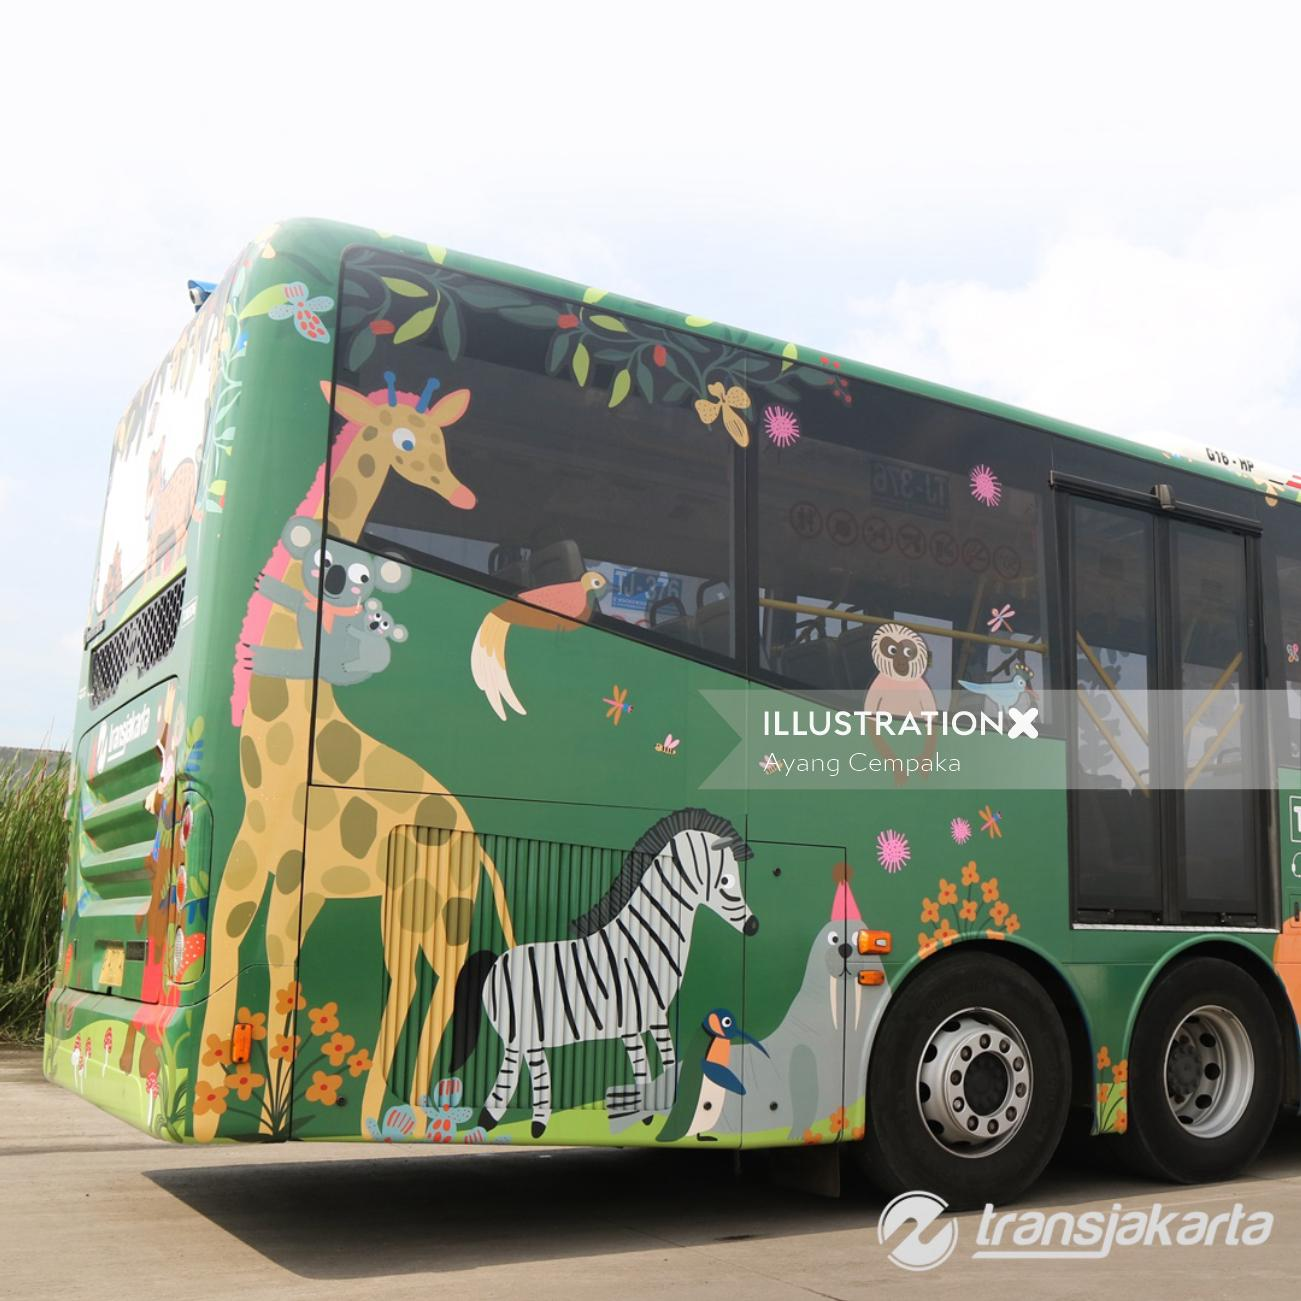 Decorative zebra on bus